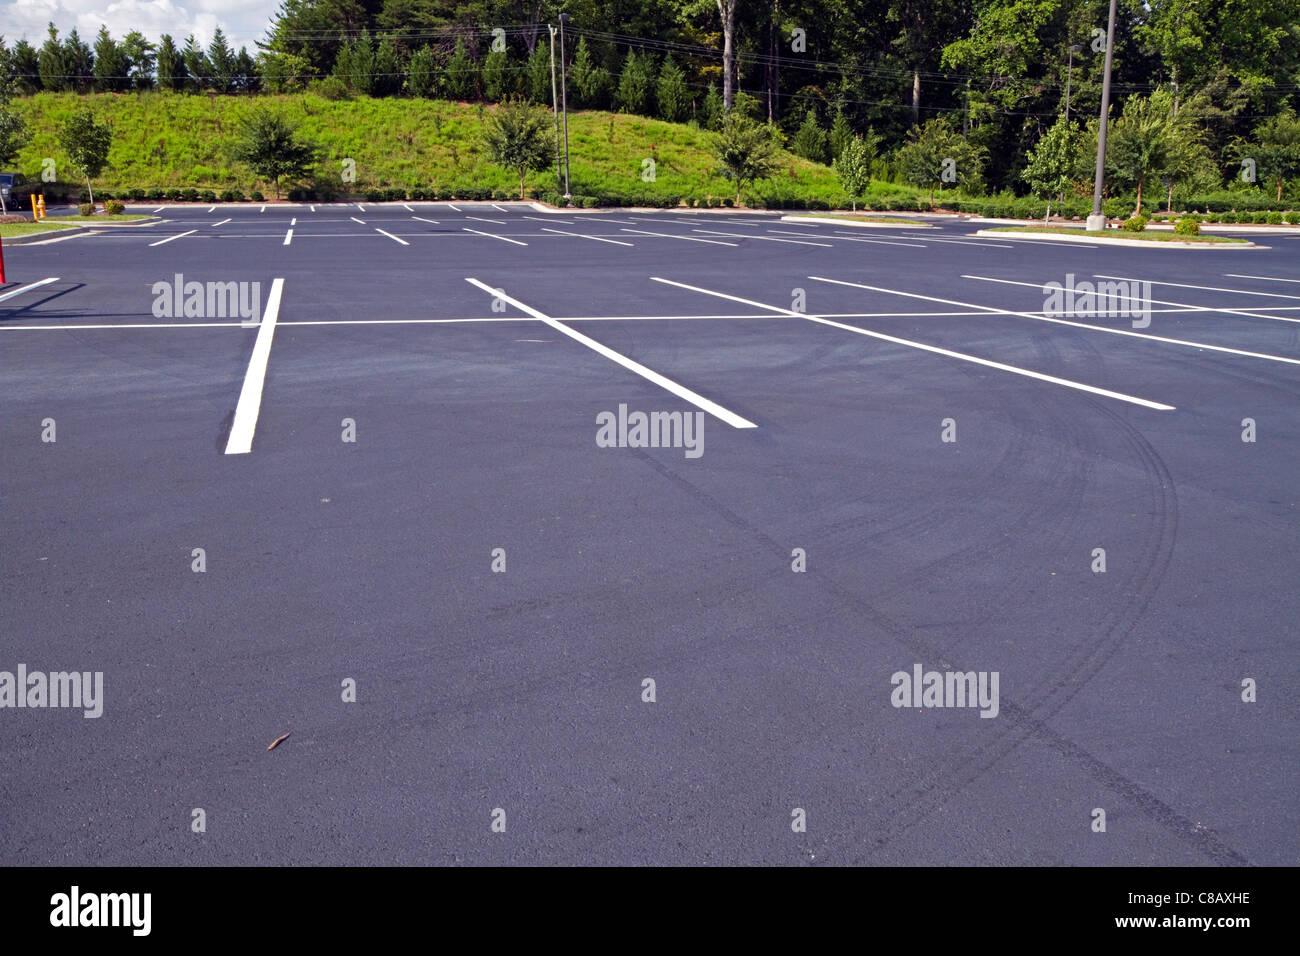 New Parking Lot - Fresh Pavement - Stock Image